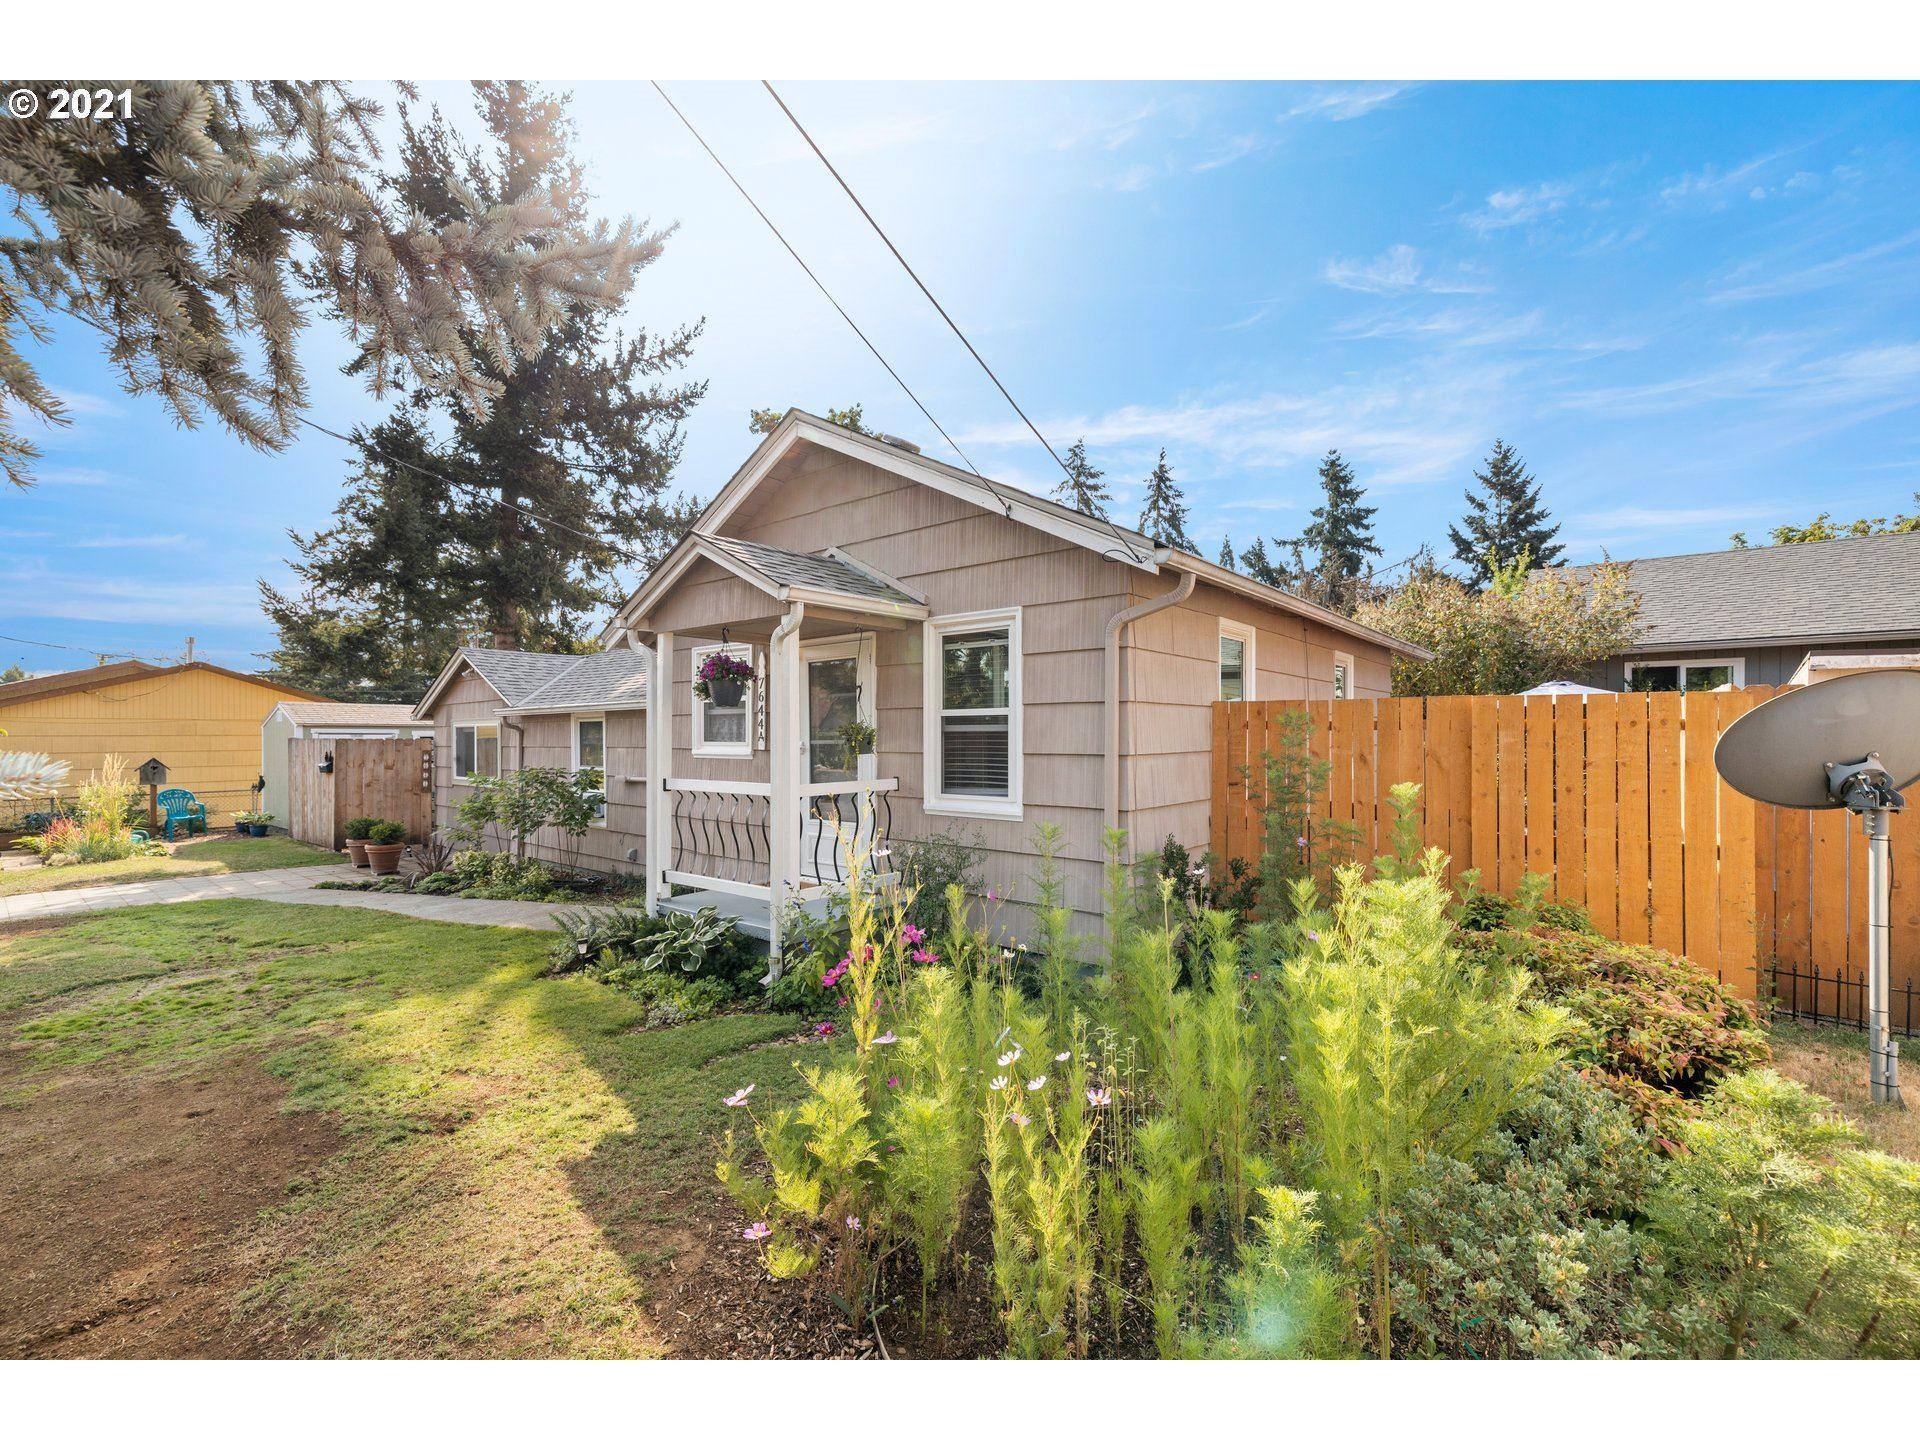 7644 SE CRYSTAL SPRINGS BLVD, Portland, OR 97206 - MLS#: 21412999